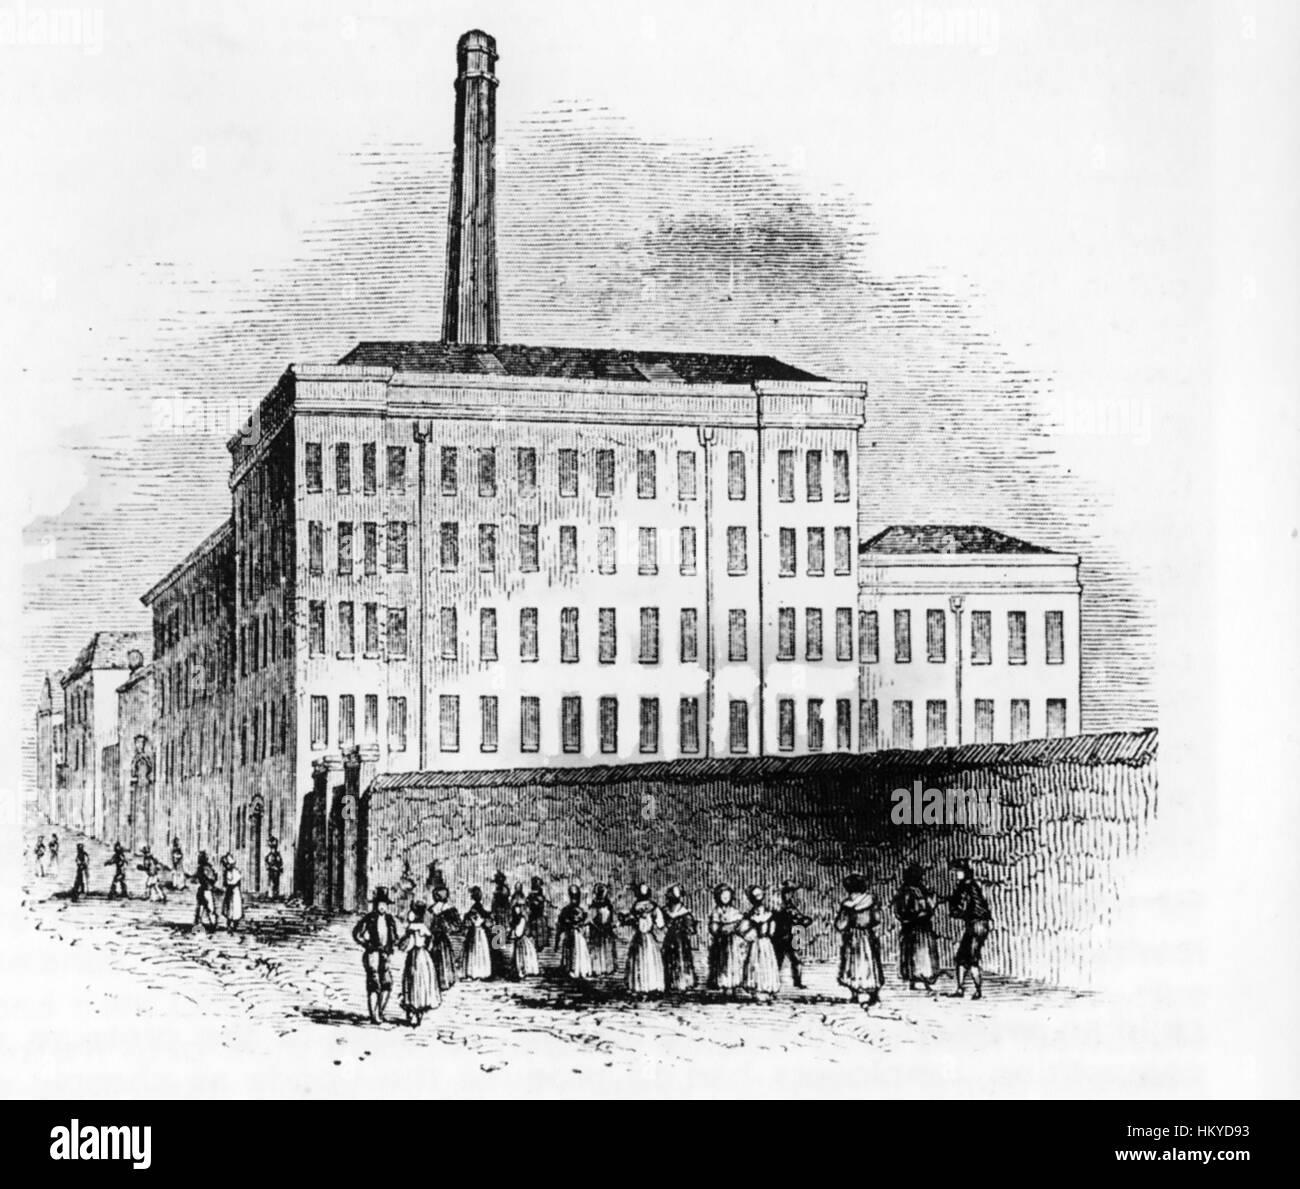 Linen Mill Stock Photos & Linen Mill Stock Images - Alamy